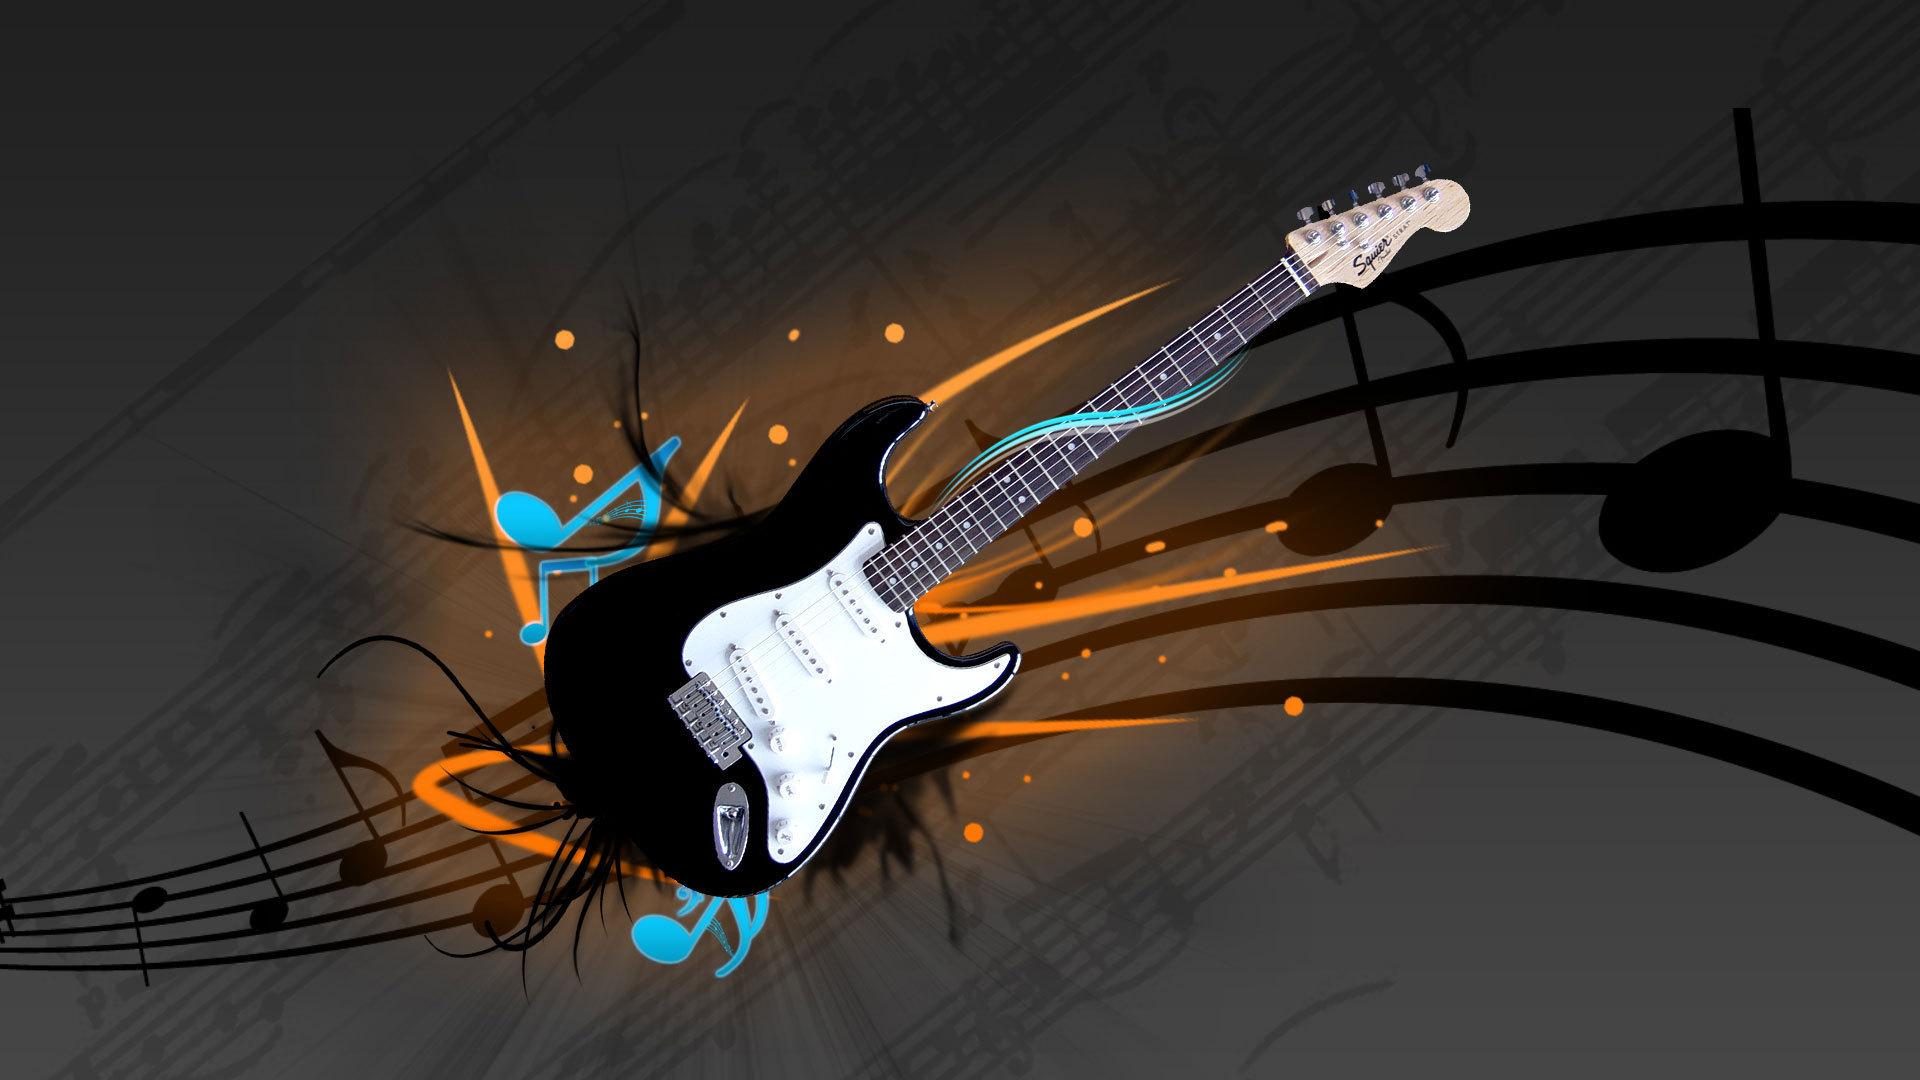 Guitare fonds d 39 cran arri res plan 1920x1080 id 195106 - Free guitar wallpapers for pc ...